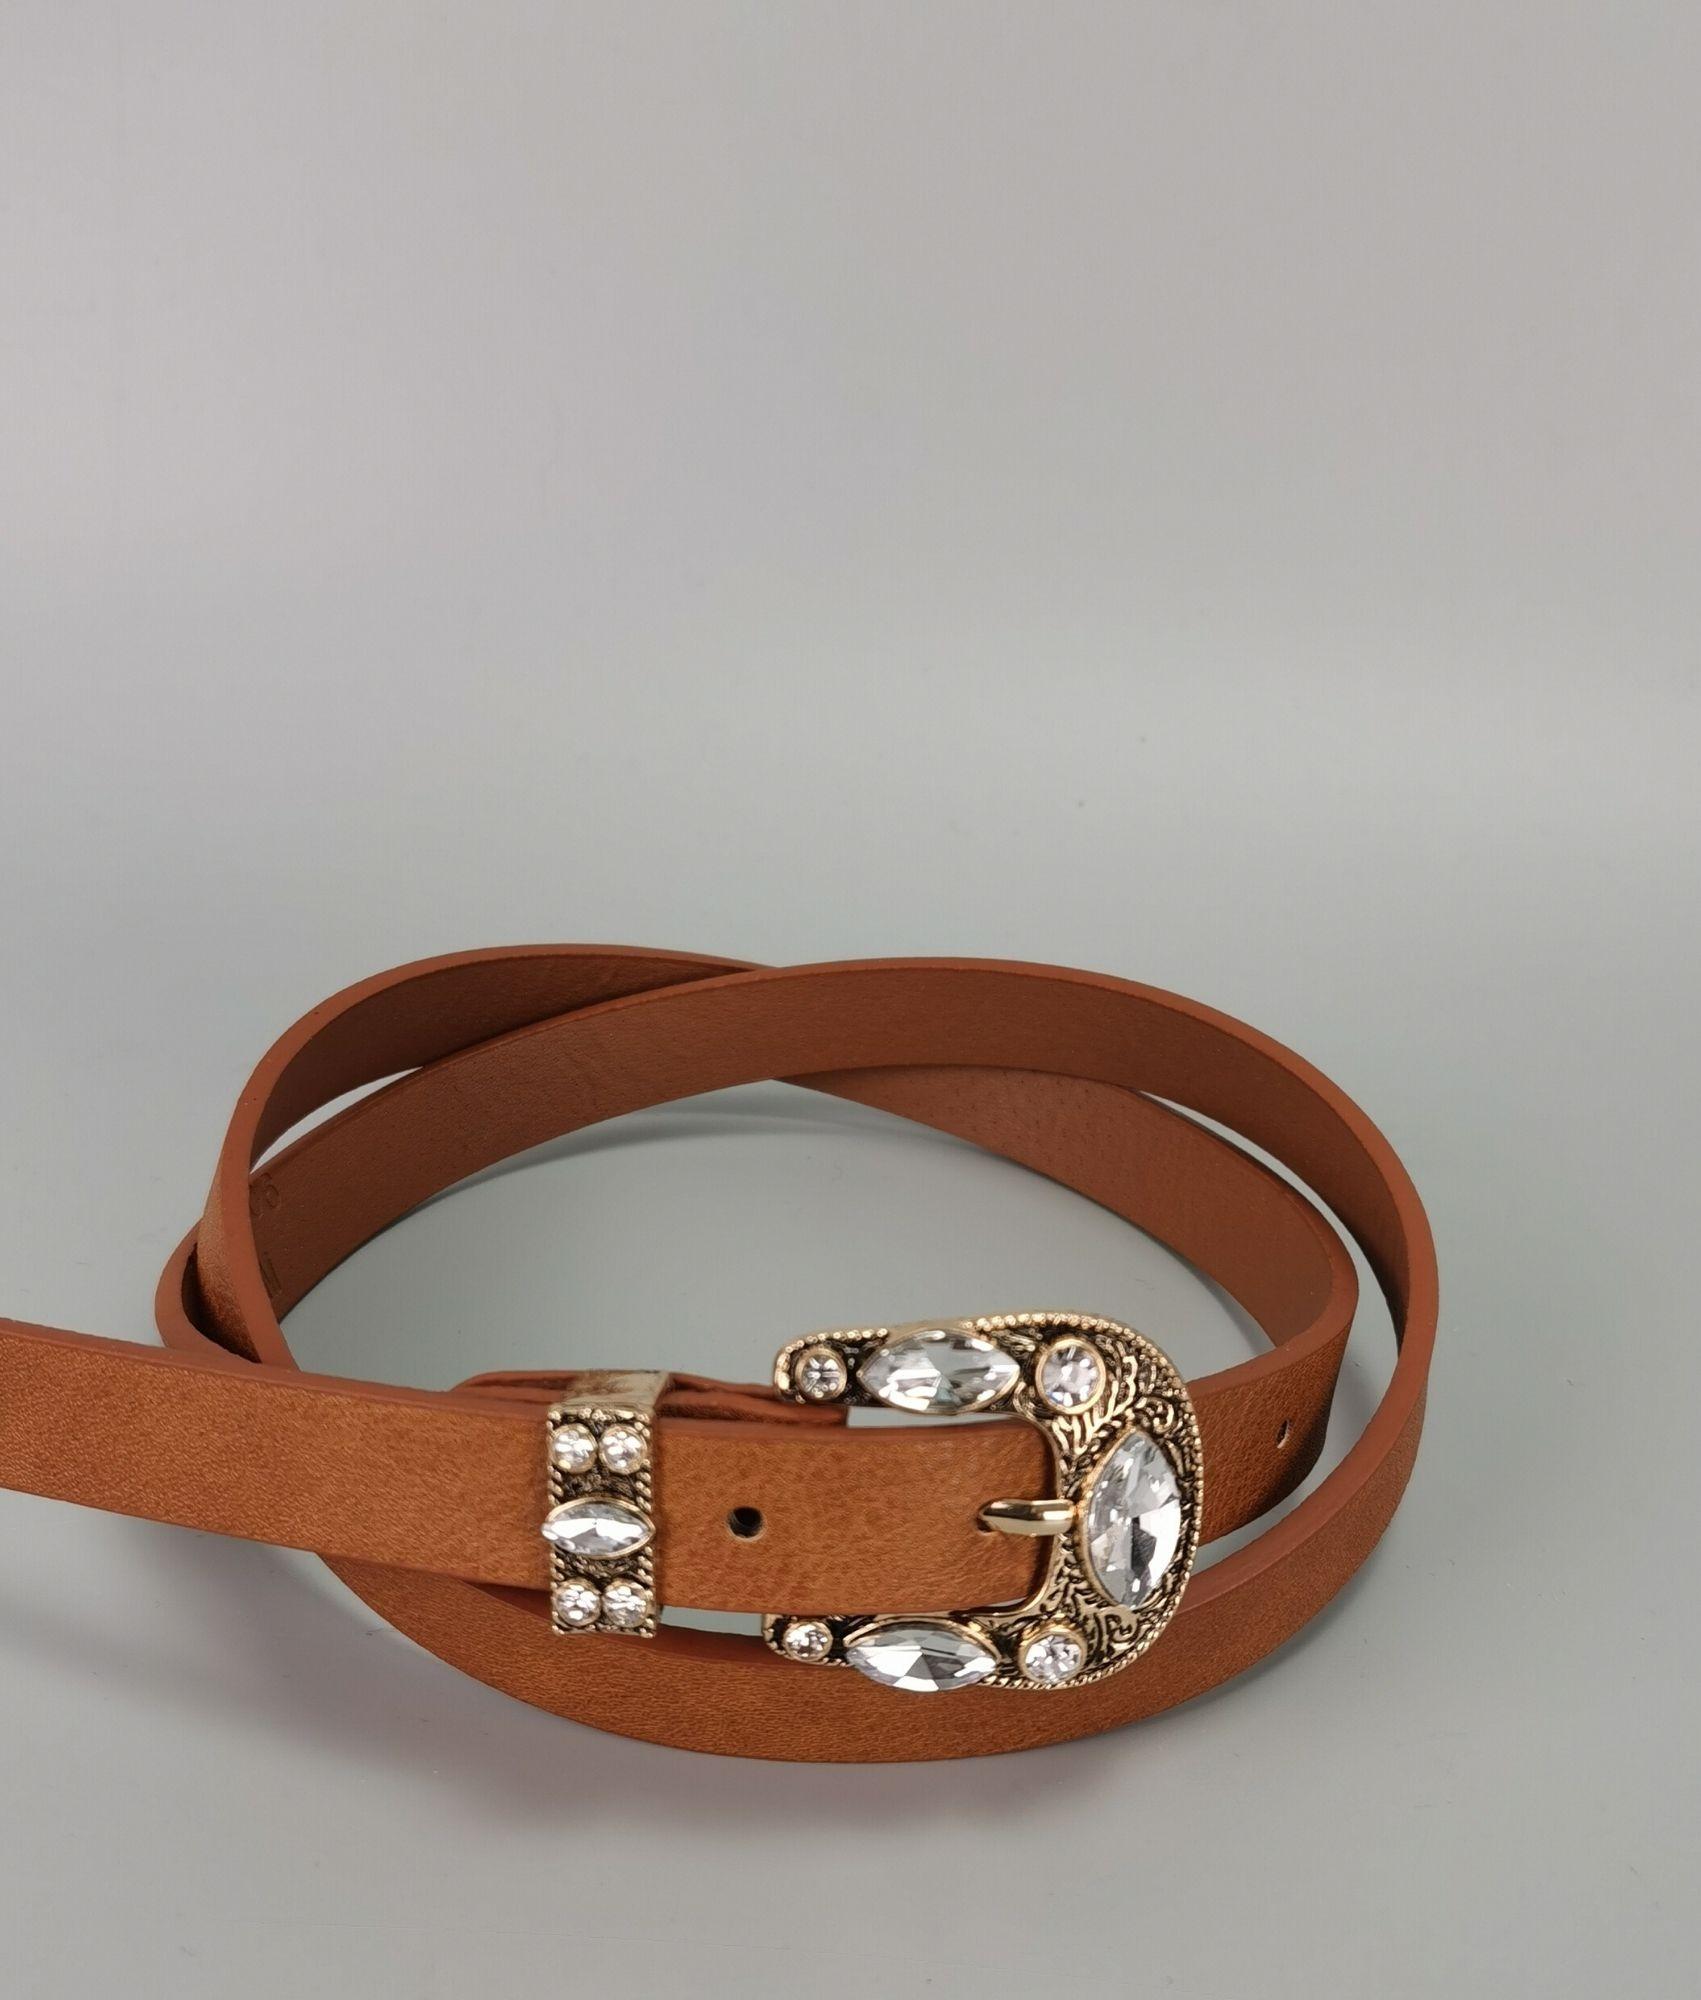 Cinturón Aladin - Beige